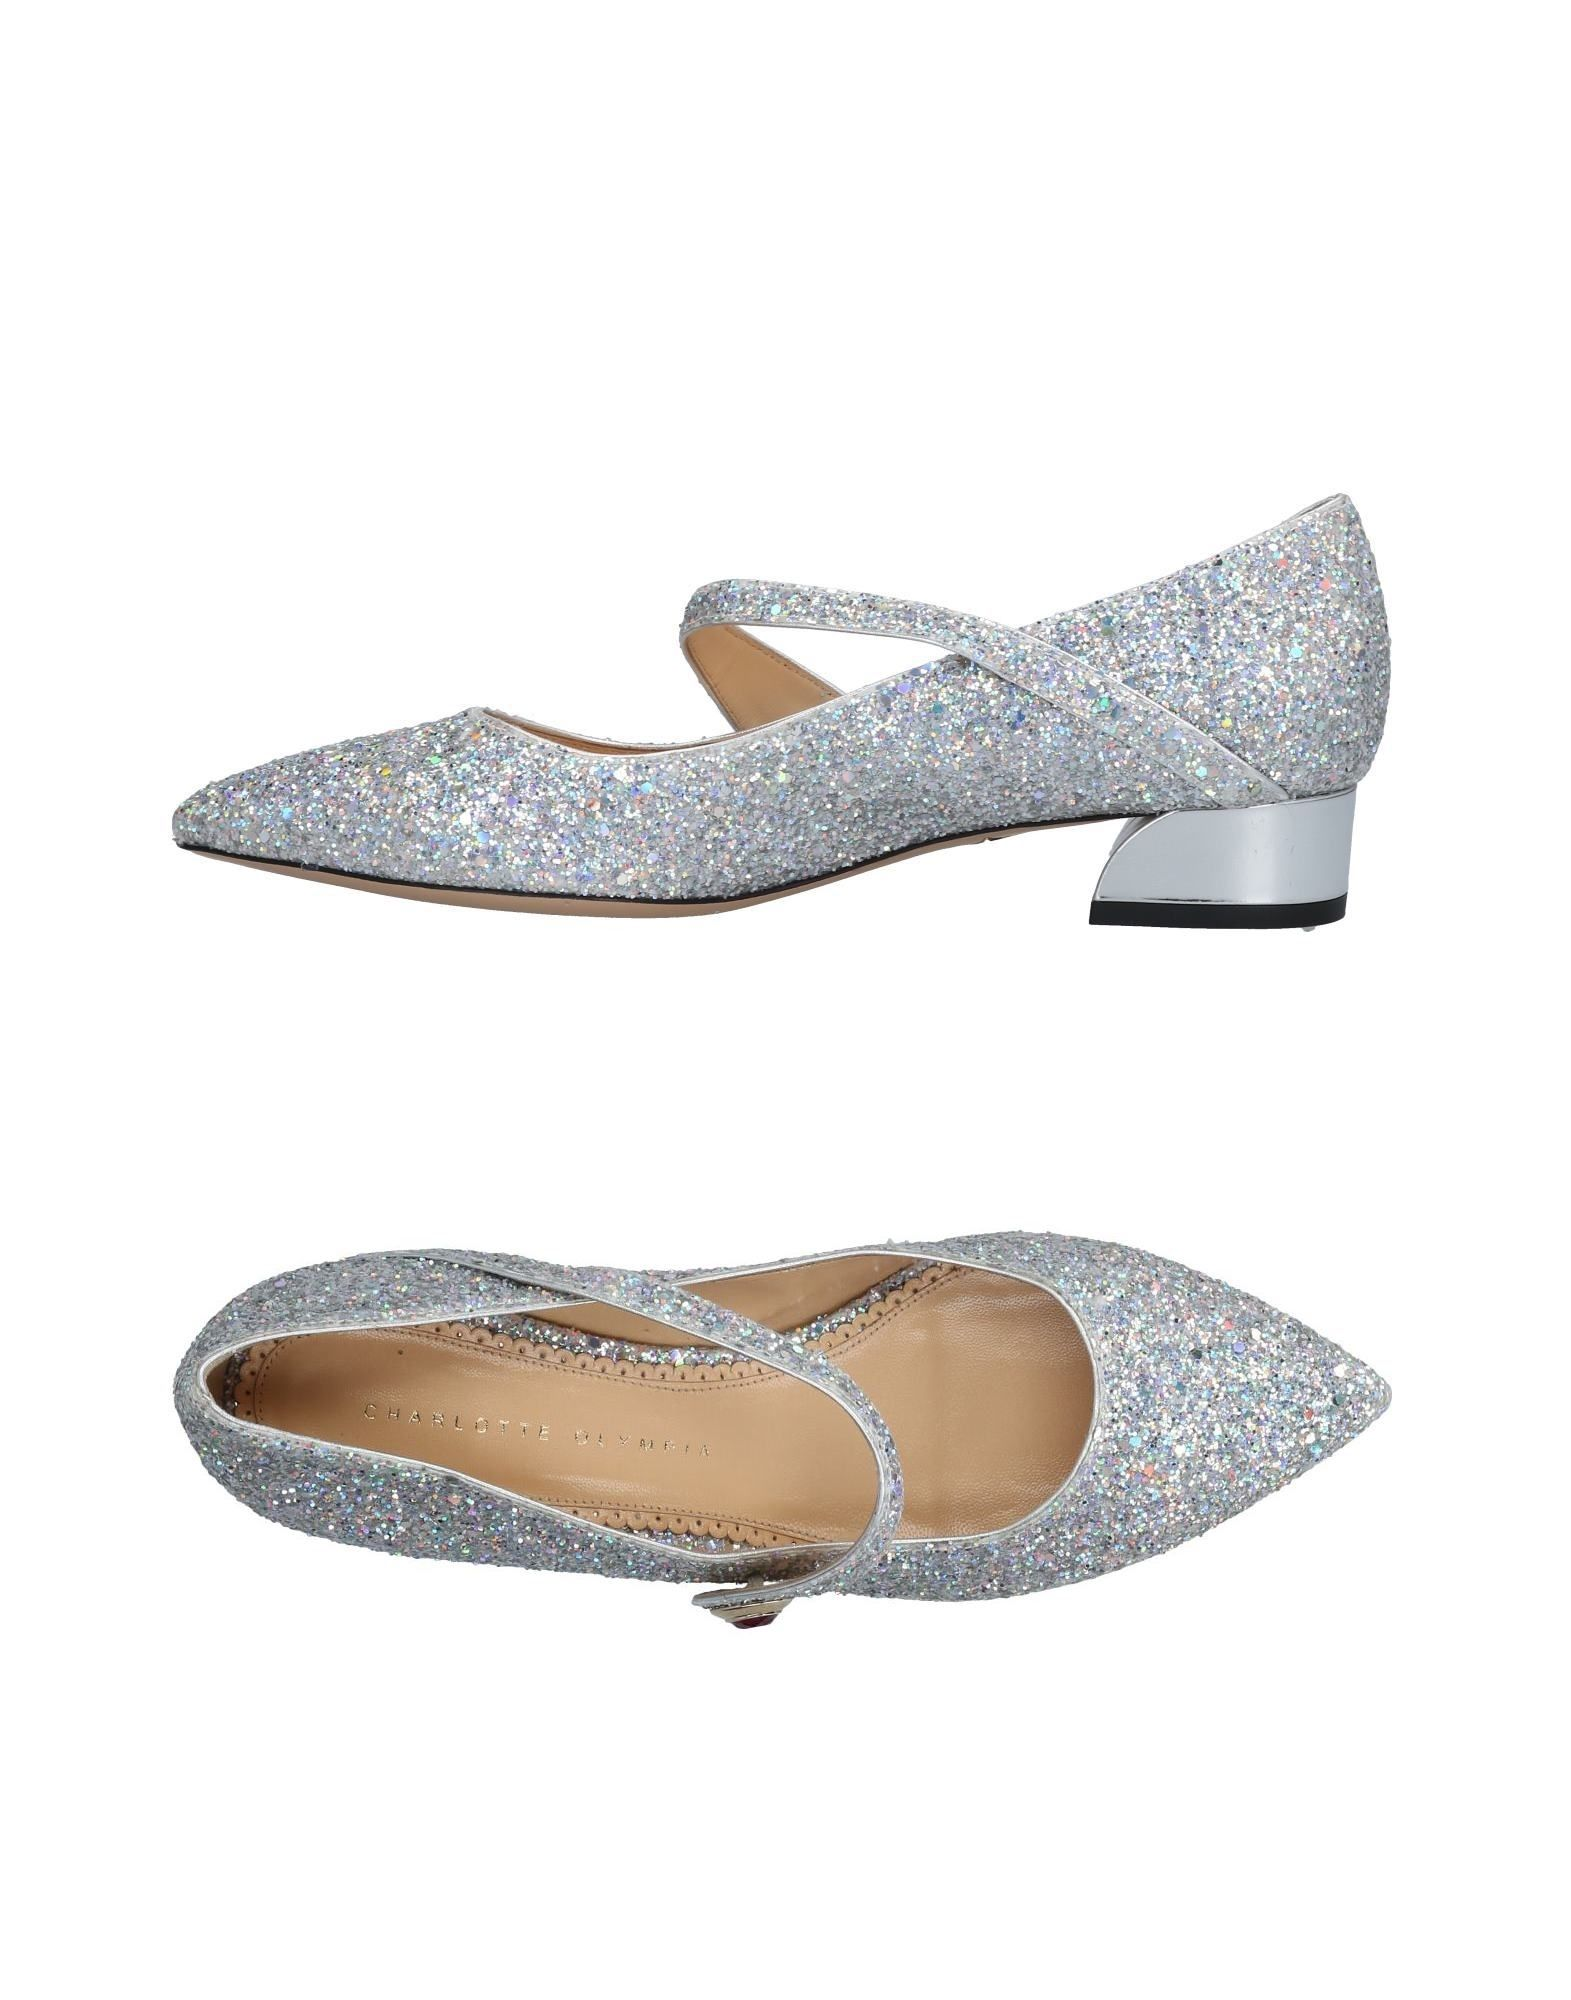 Charlotte Olympia Pumps Damen  11477678KIGut aussehende strapazierfähige Schuhe